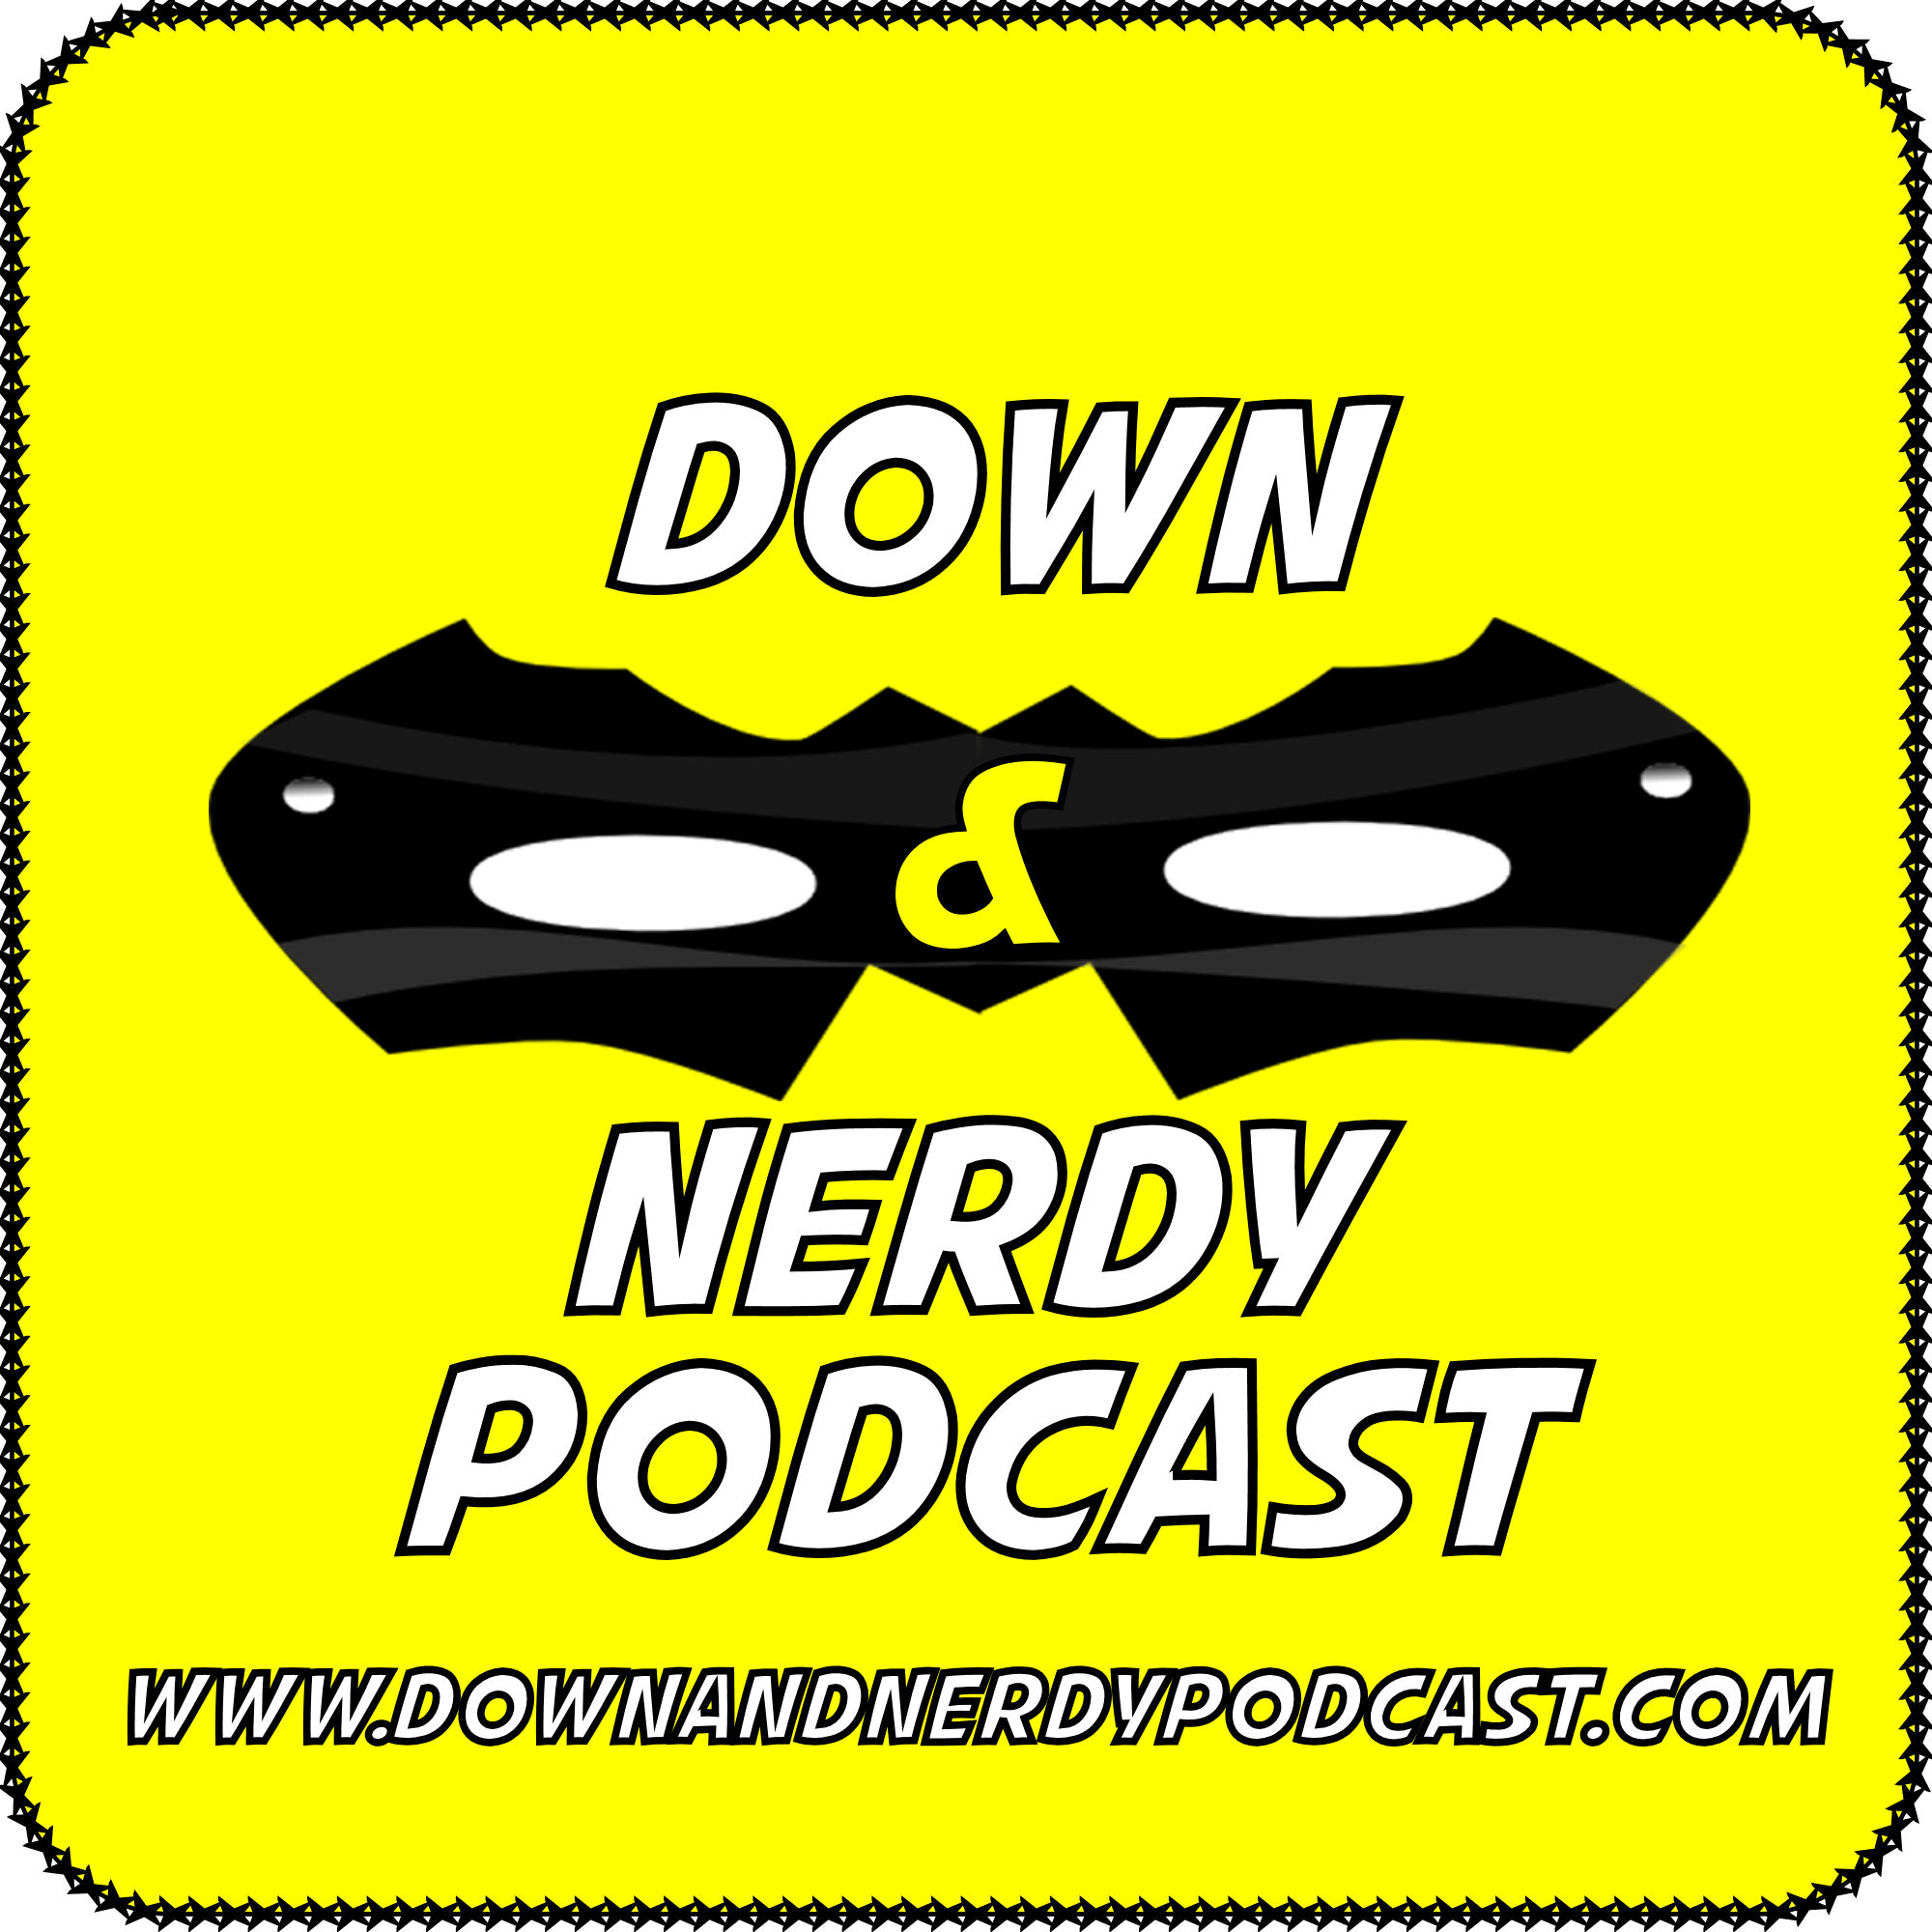 Artwork for Ep 366 - The Nevers & DC's Legends of Tomorrow - Rochelle Neil, Vinnie Heaven & Adam Tsekhman Interviews